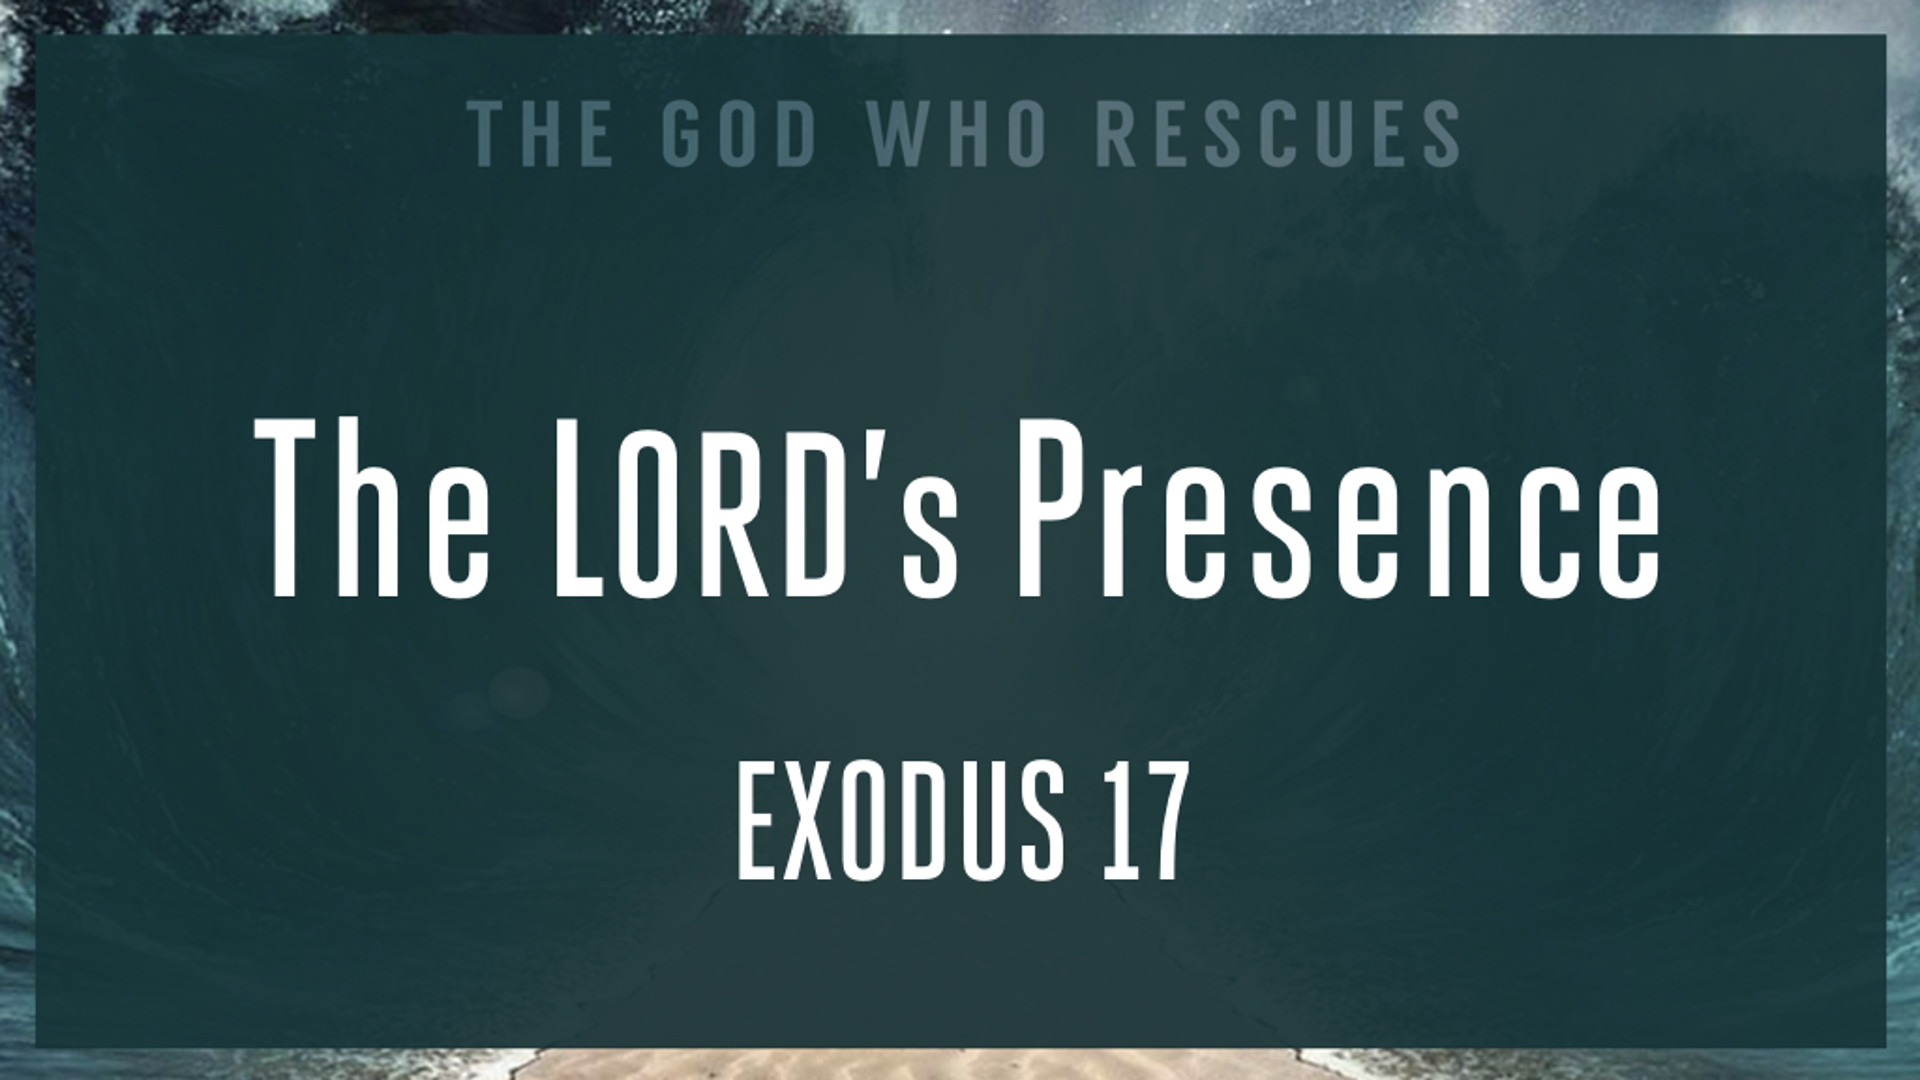 Exodus 17 The Lords Presence.jpg